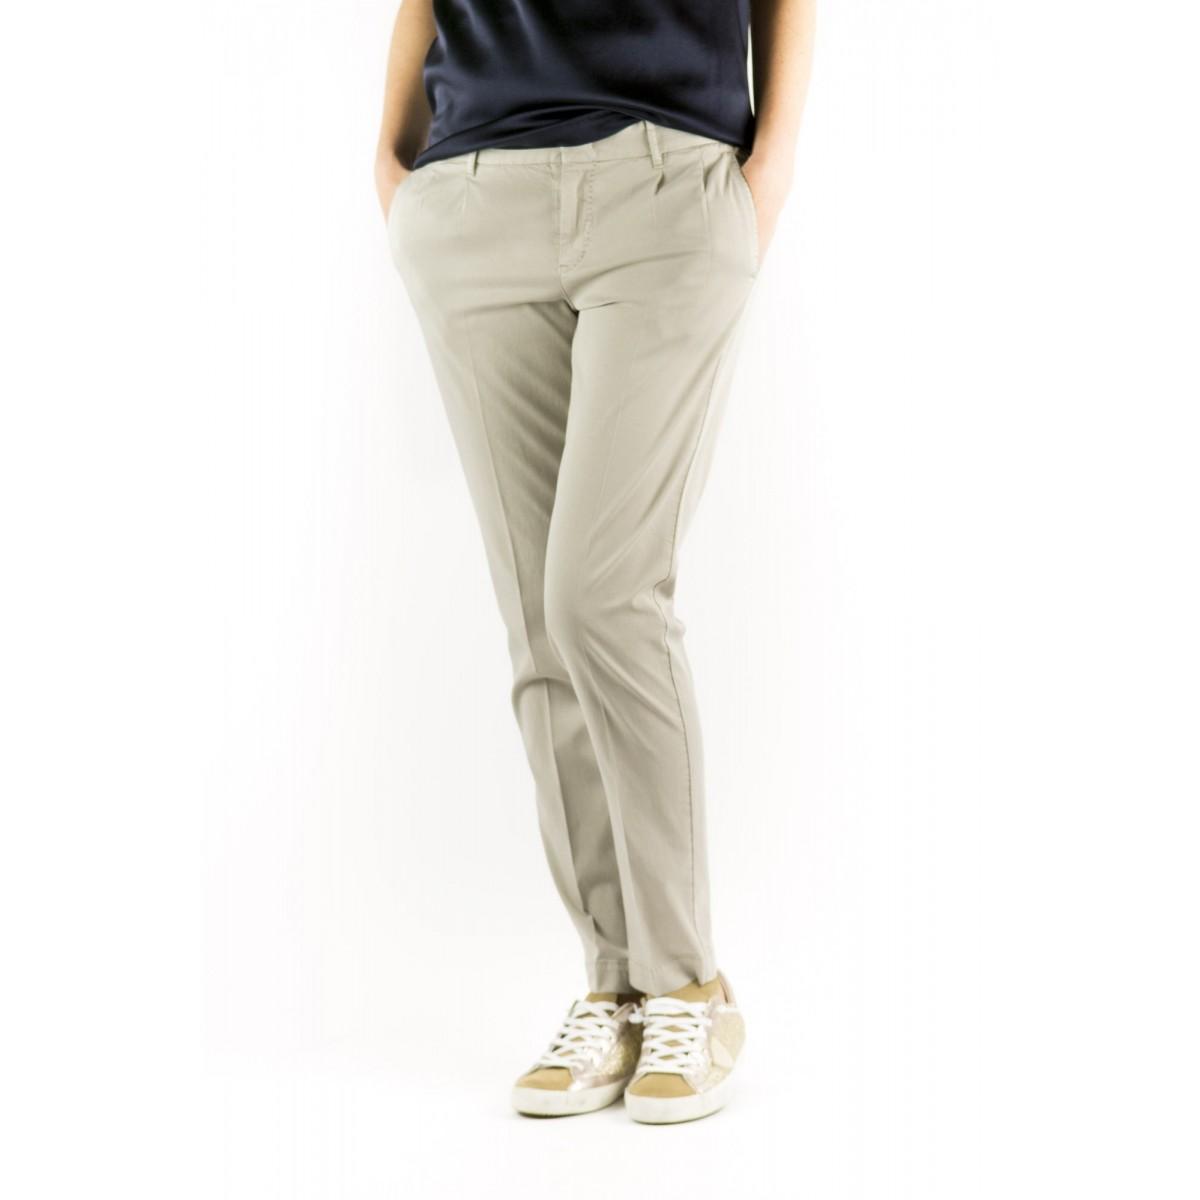 Hosen PT0W Damen - Vtc2 Eb65 Cotone Strech 0040 - beige